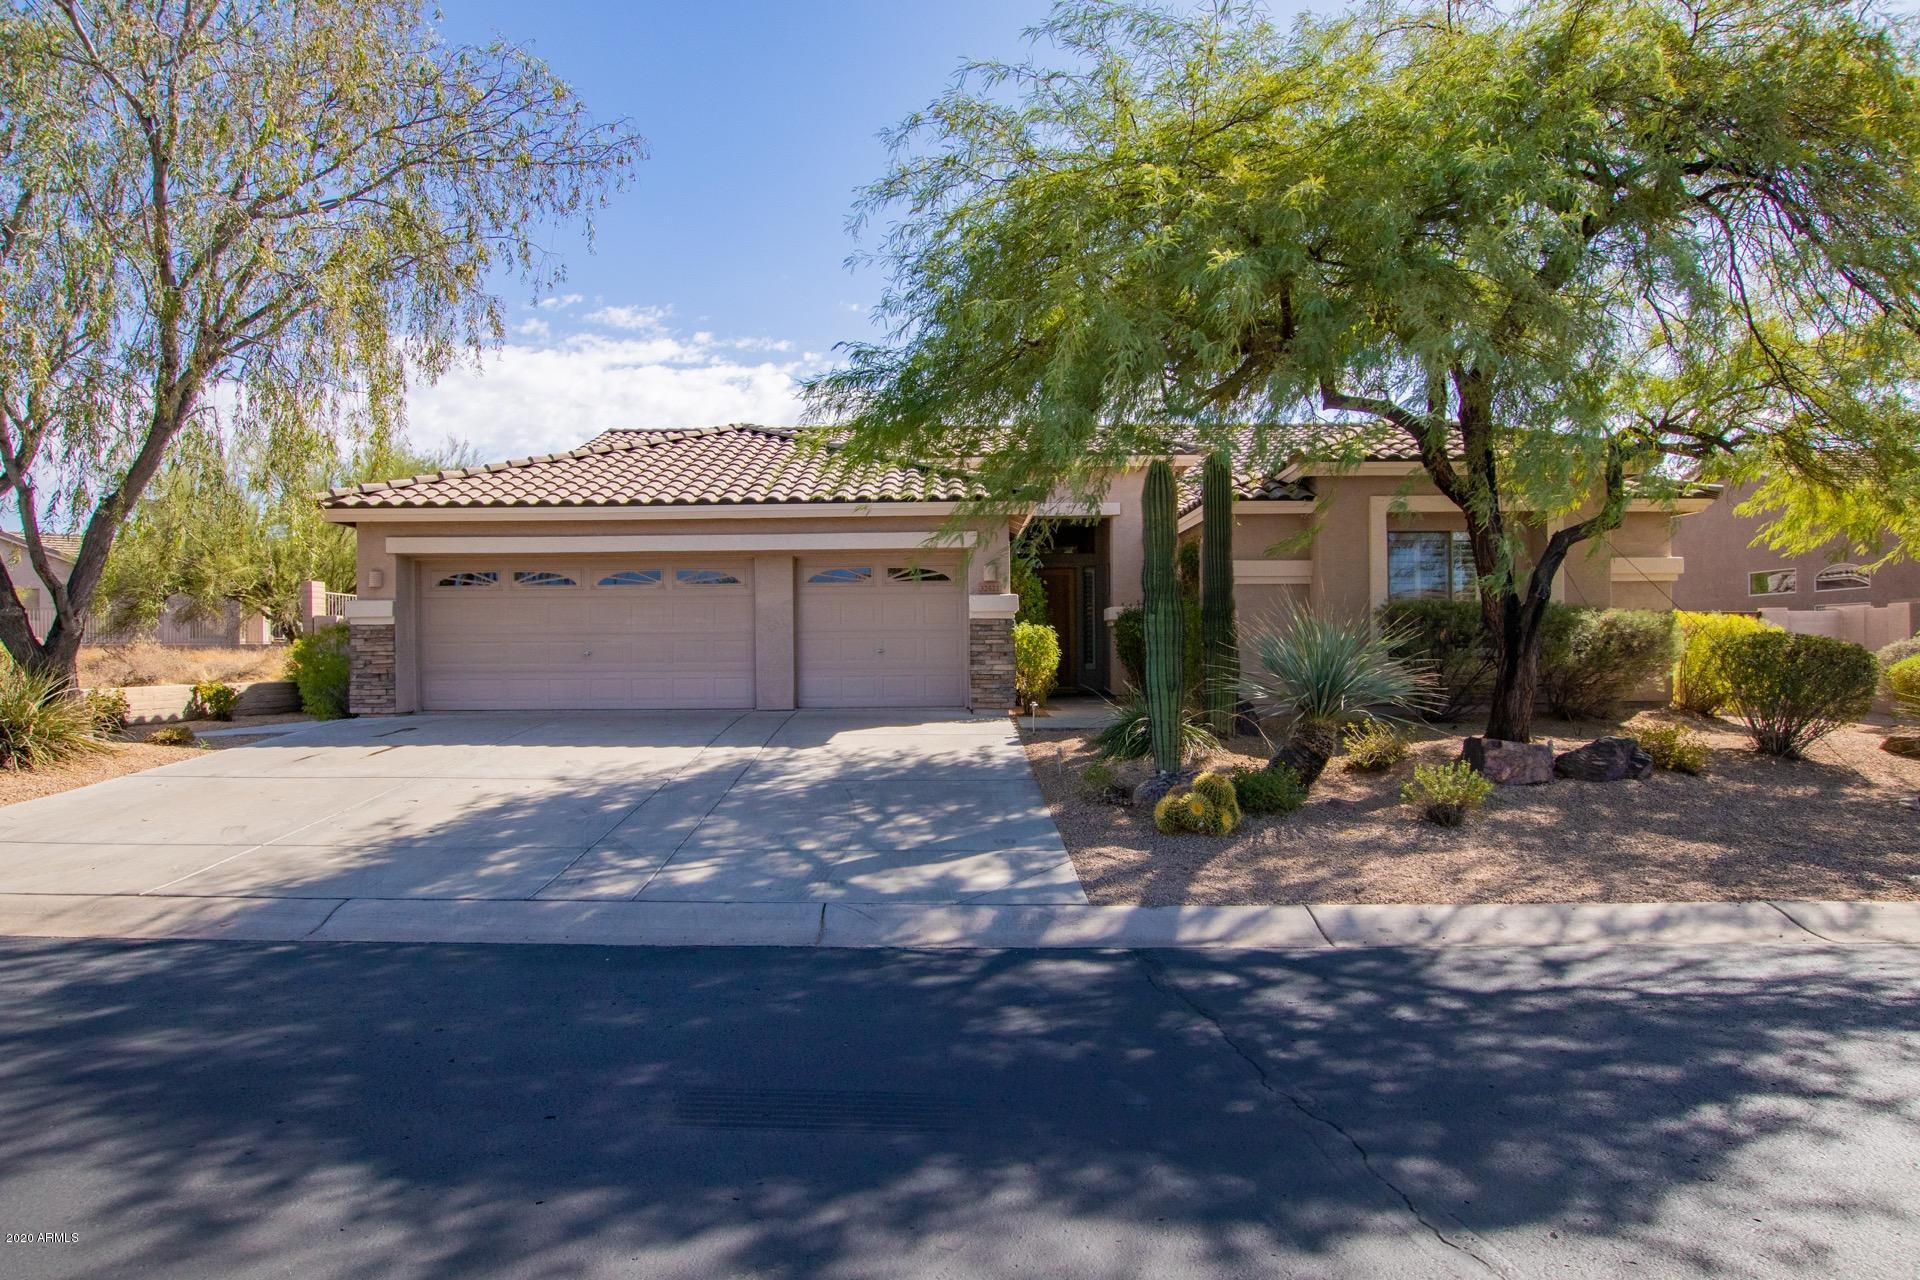 Photo for 32421 N 53rd Street, Cave Creek, AZ 85331 (MLS # 6153003)